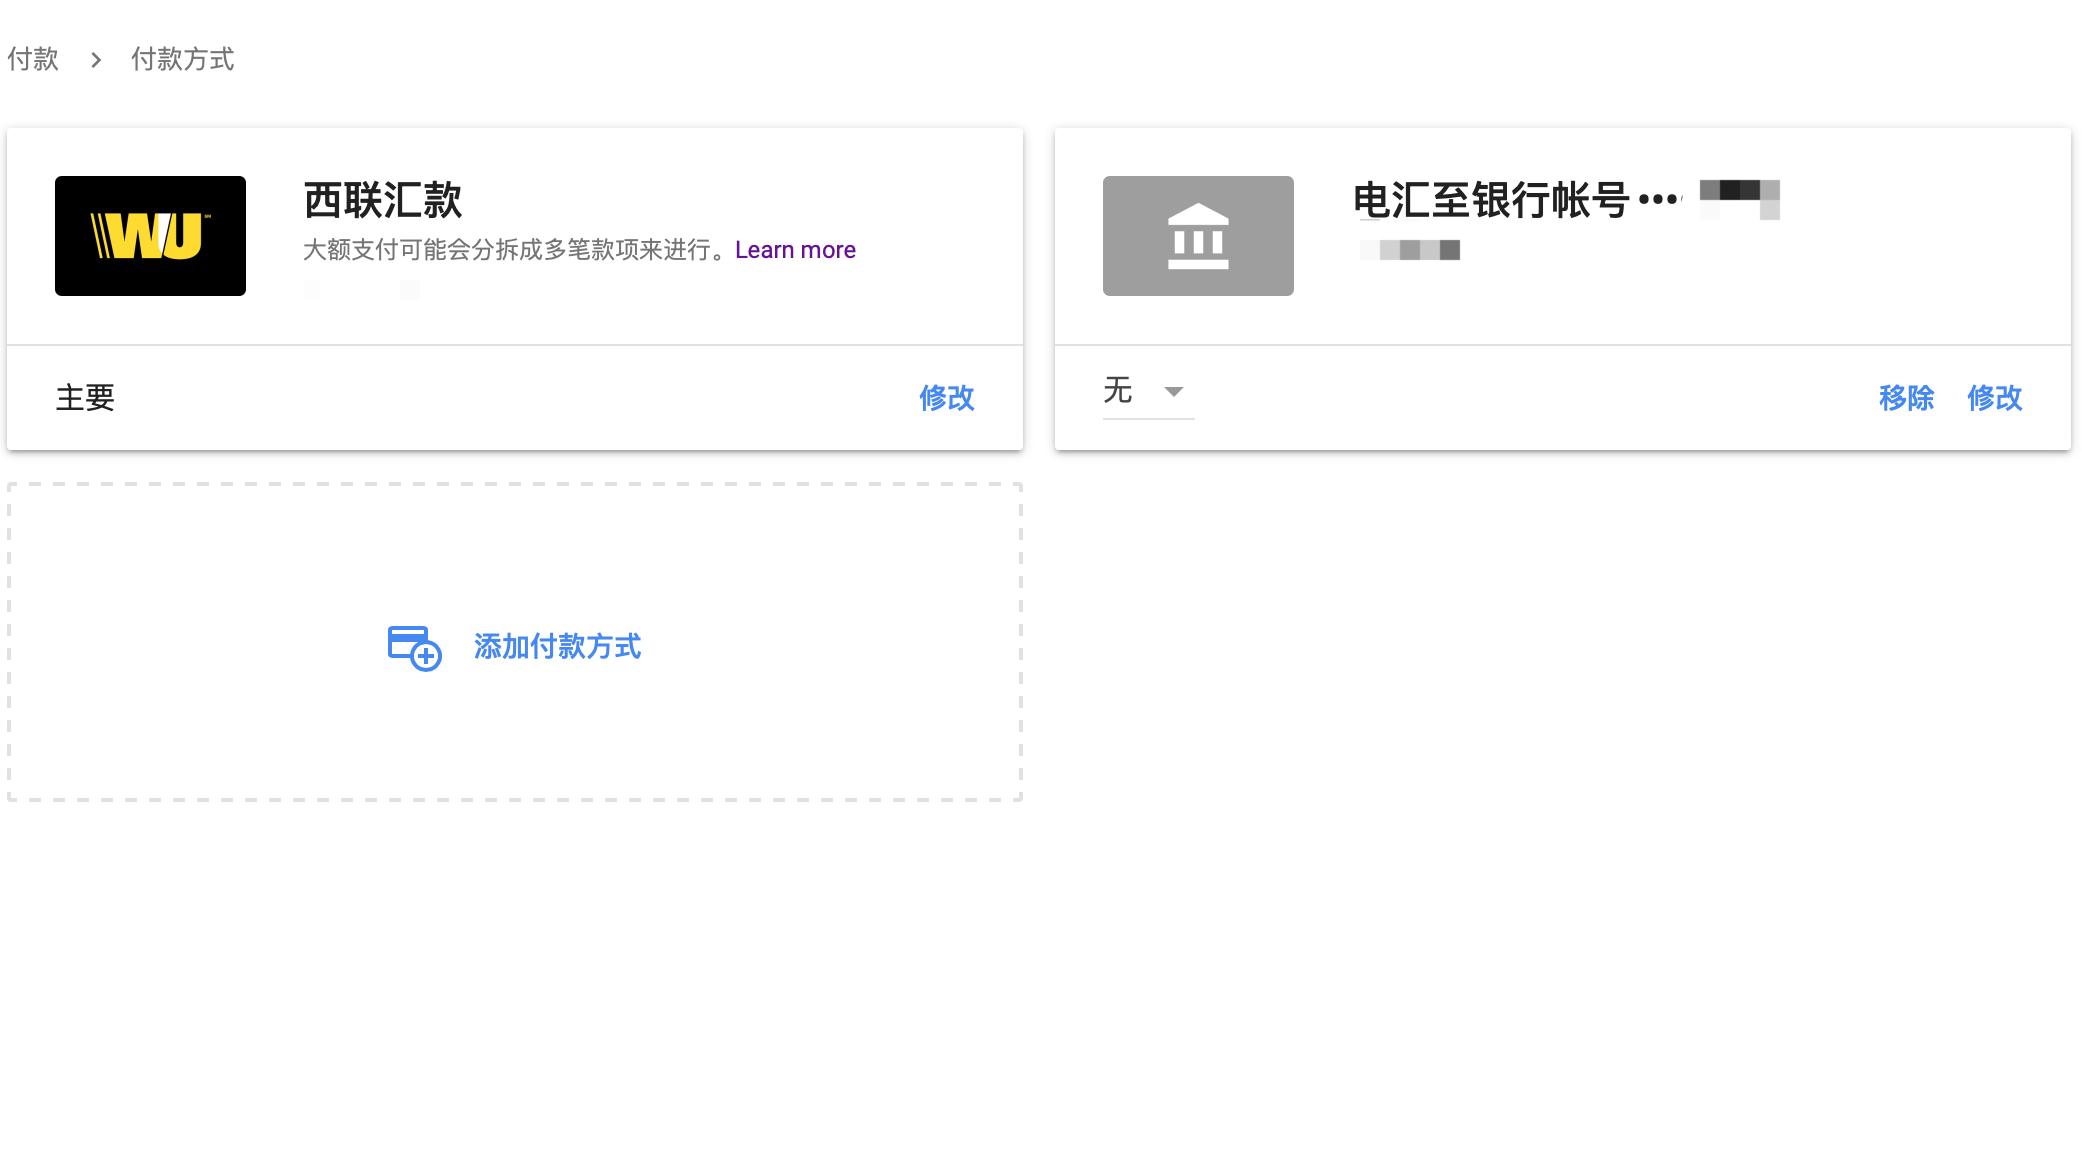 Google Adsense 西联汇款国内基本上要全部取消了!